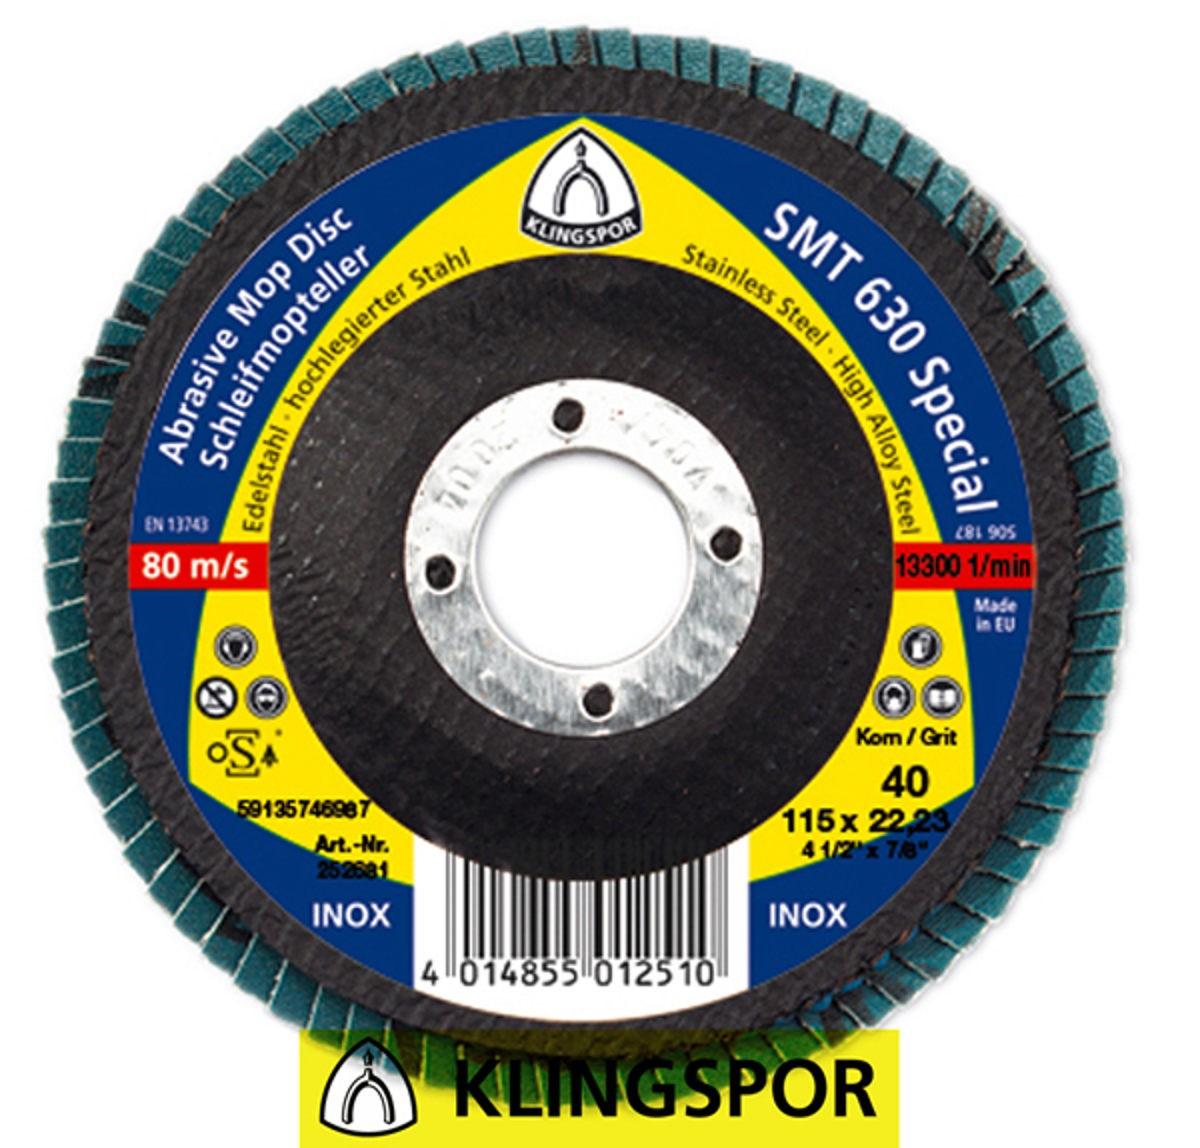 DISCO FLAP 180X22.23 G.40 SMT630 SPECIAL  KLINGSPOR SMT630